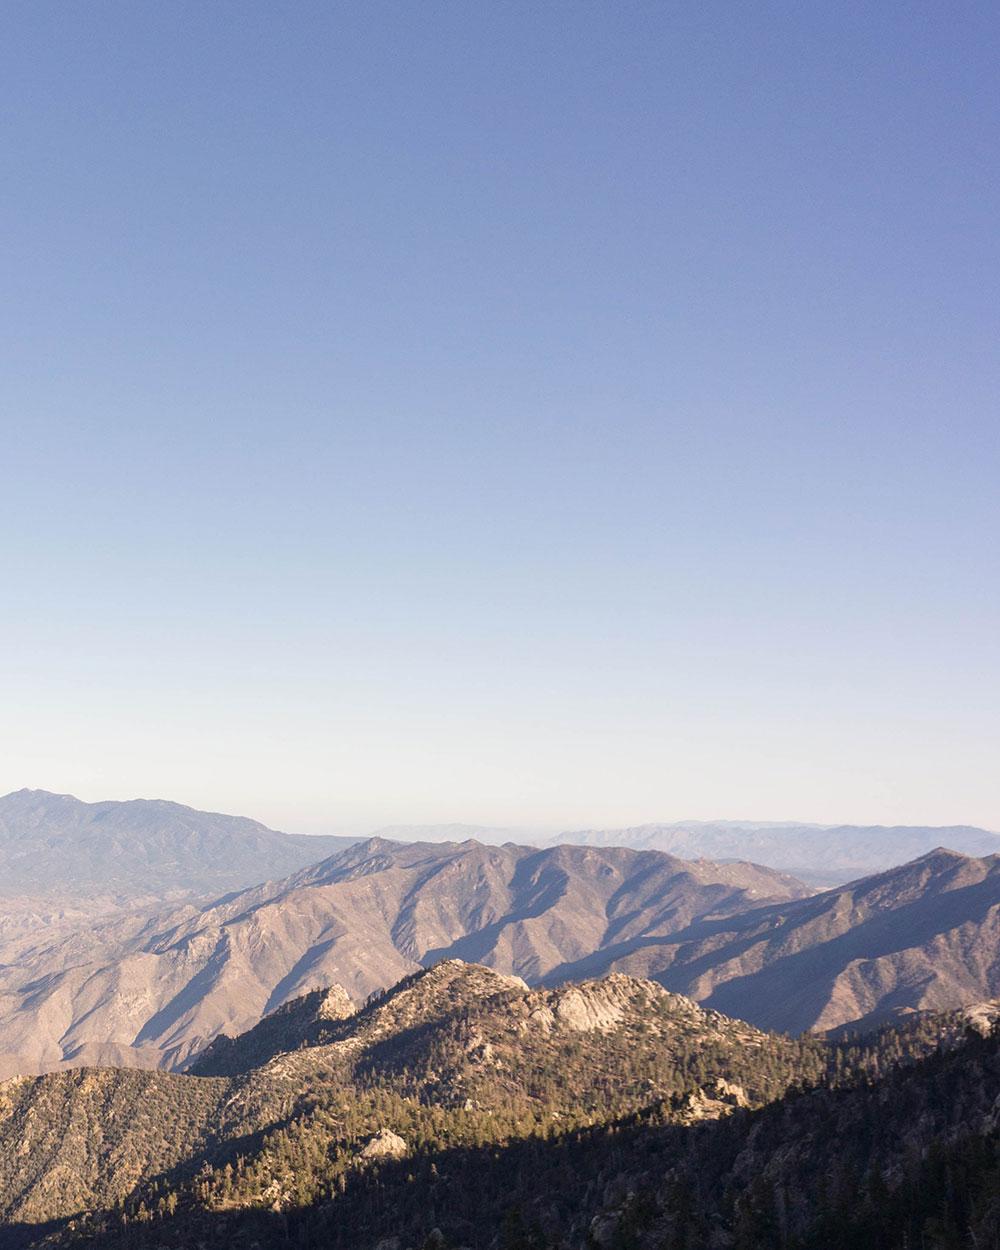 Valley vista along the Desert View Trail